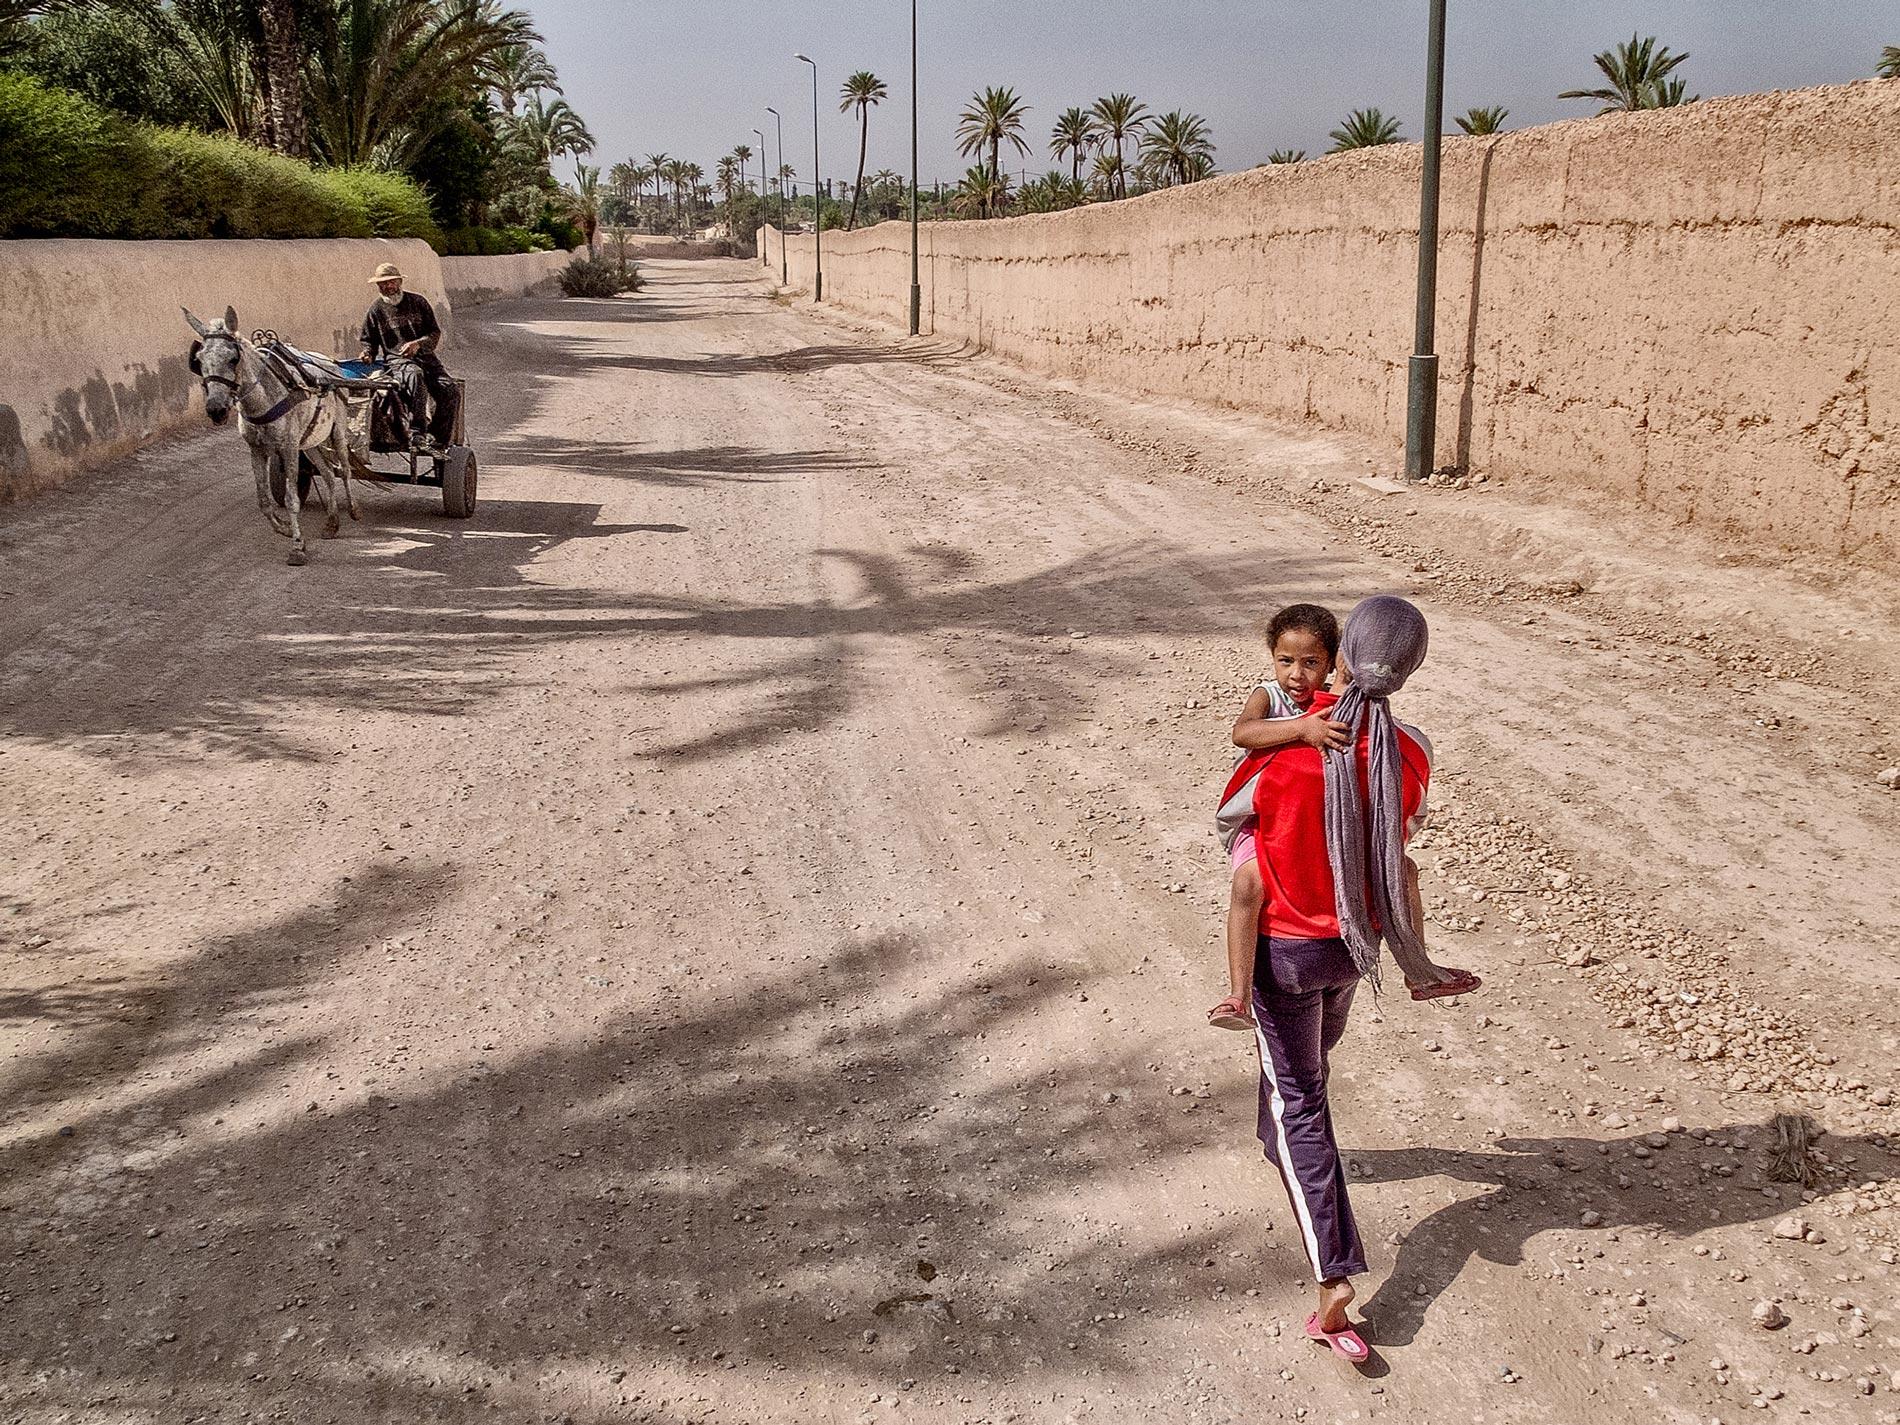 Girl, child, man and donkey - Marrakech